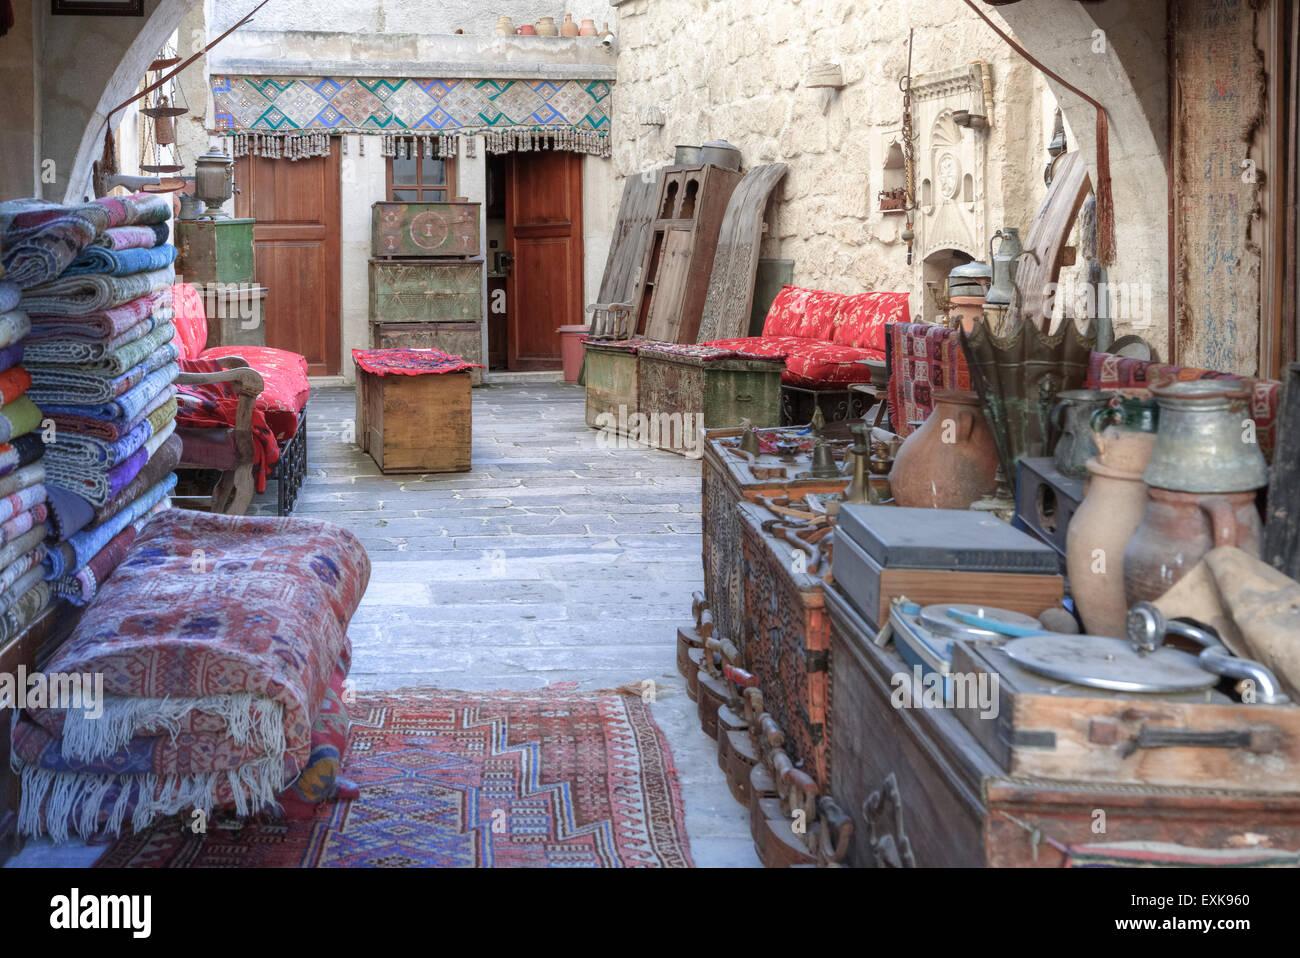 Turkish carpet shop in Goereme, Cappadocia, Anatolia, Turkey - Stock Image